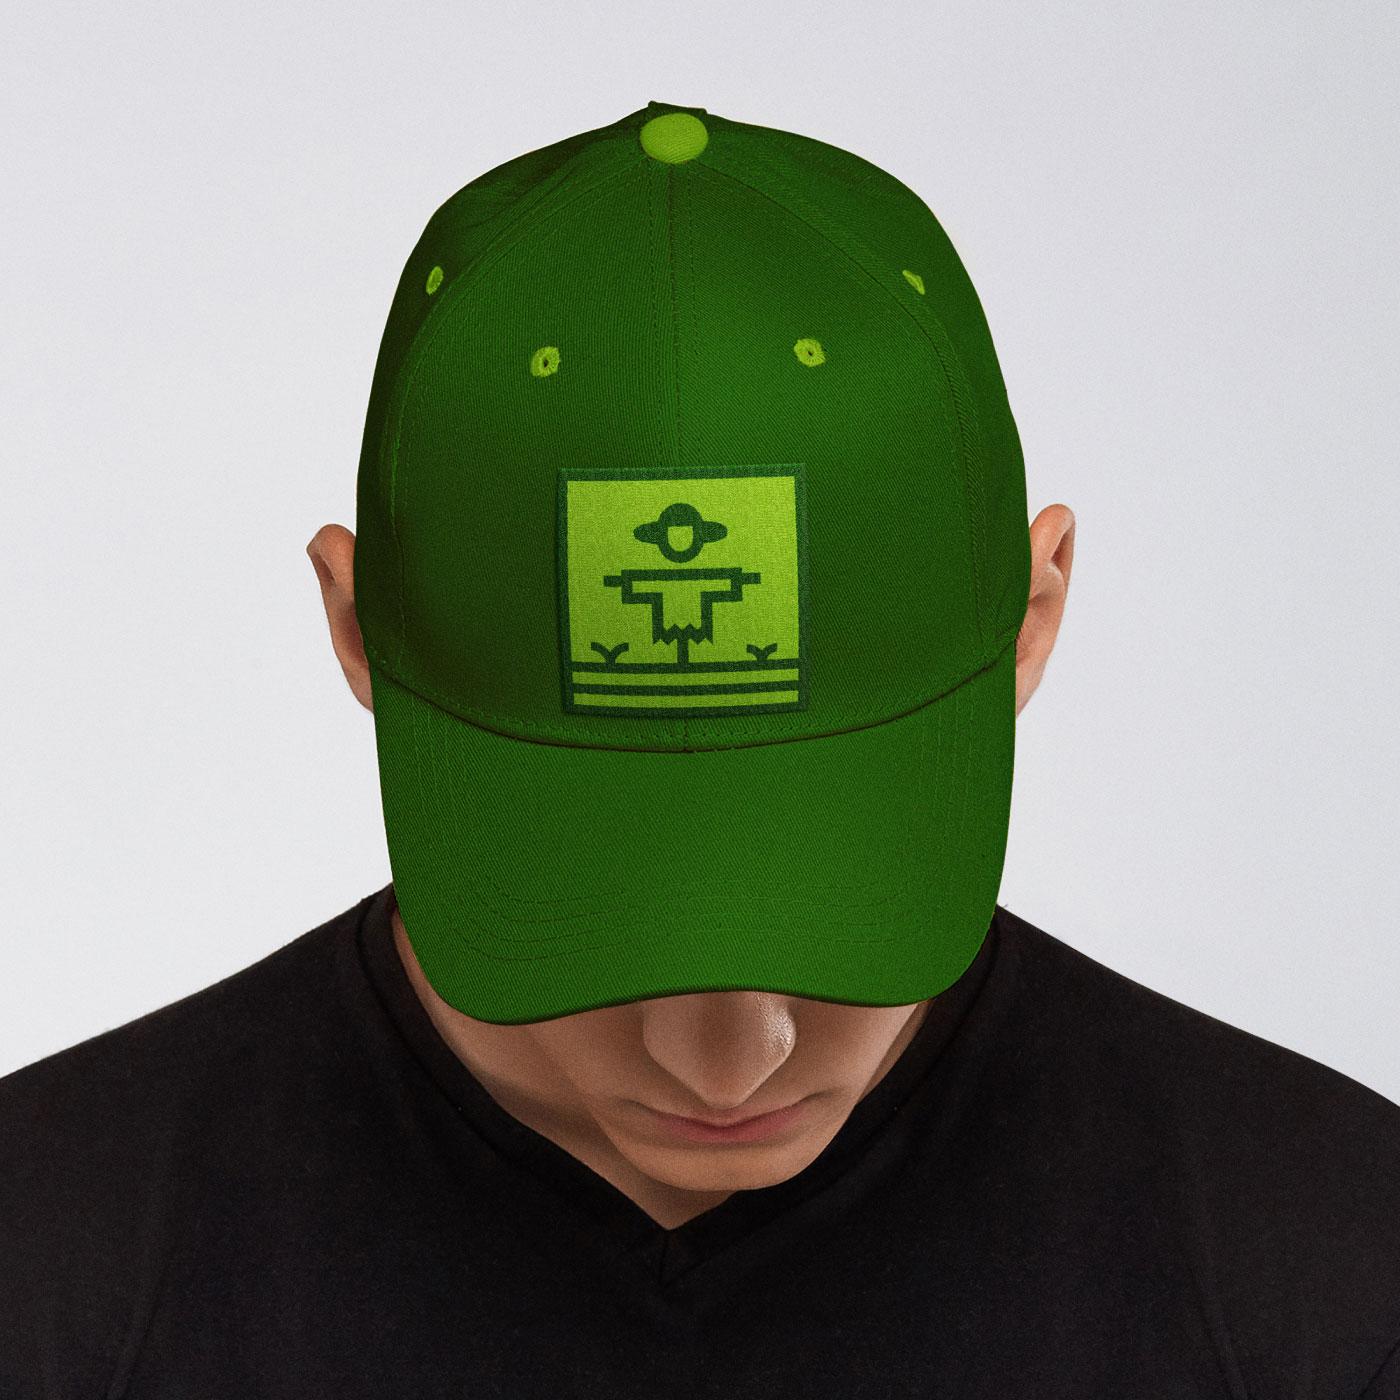 Cap_Front_Flatten_Crop_1400_q60_02